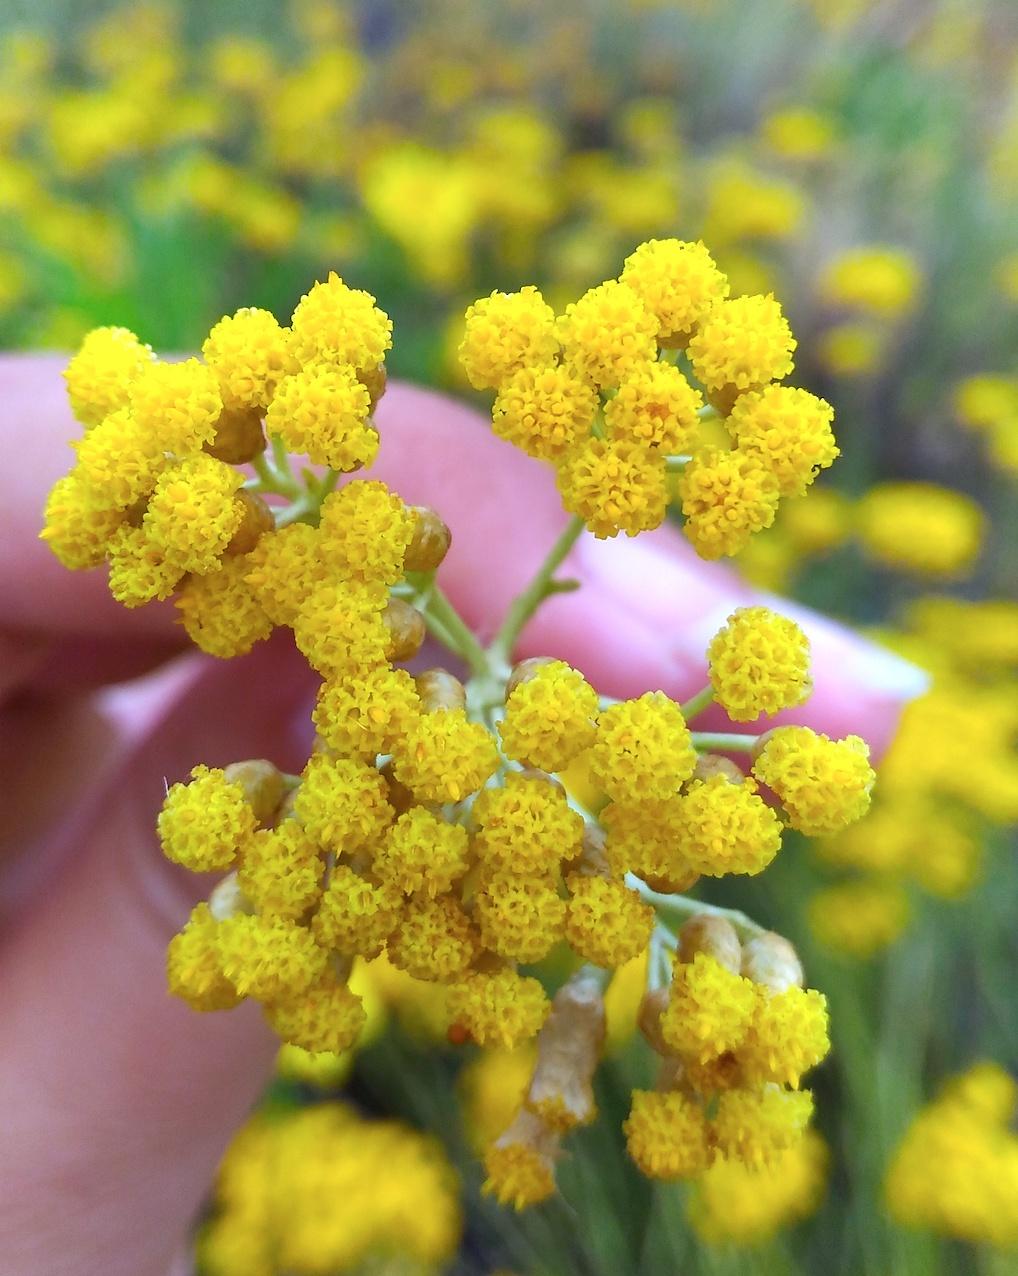 recolte-helichryse-huile-essentielle-naturactive-bog-voyage-beaute-1